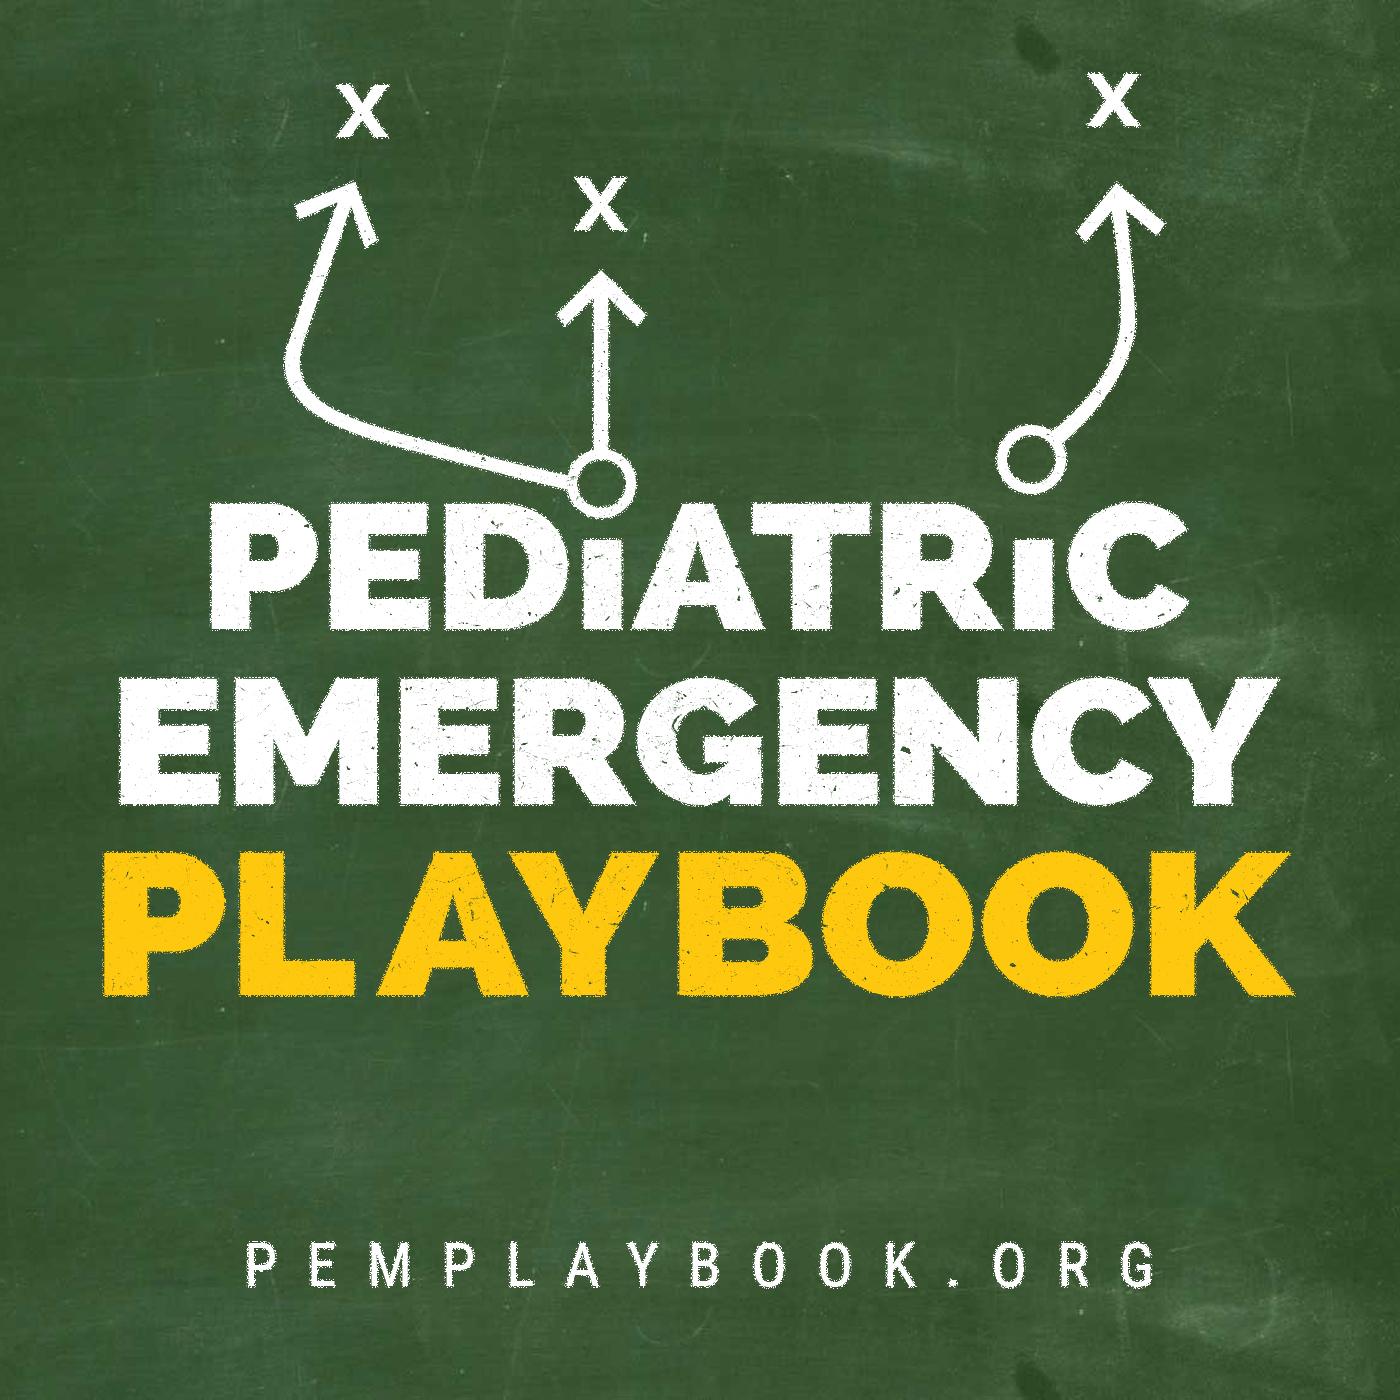 Pediatric Emergency Playbook